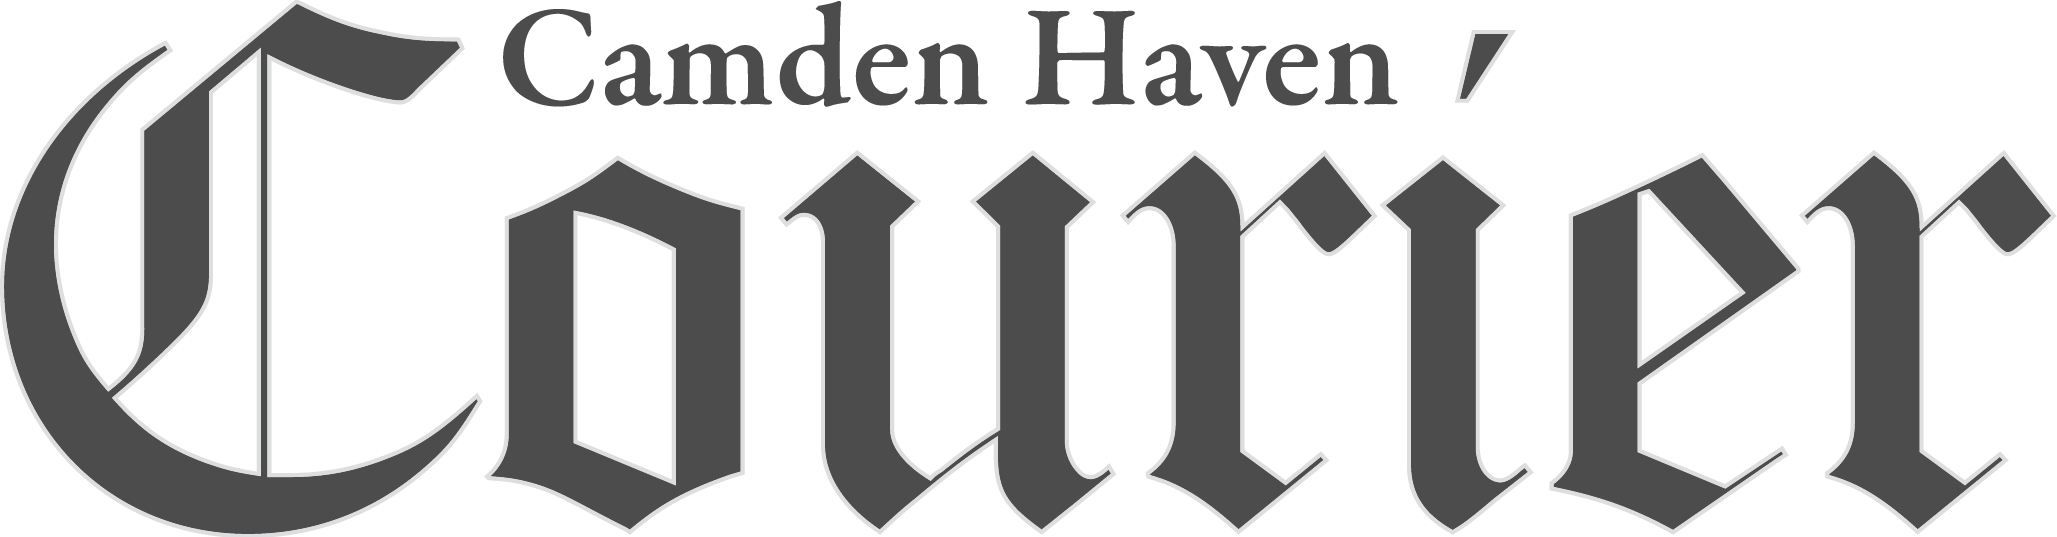 Camden Haven Courier